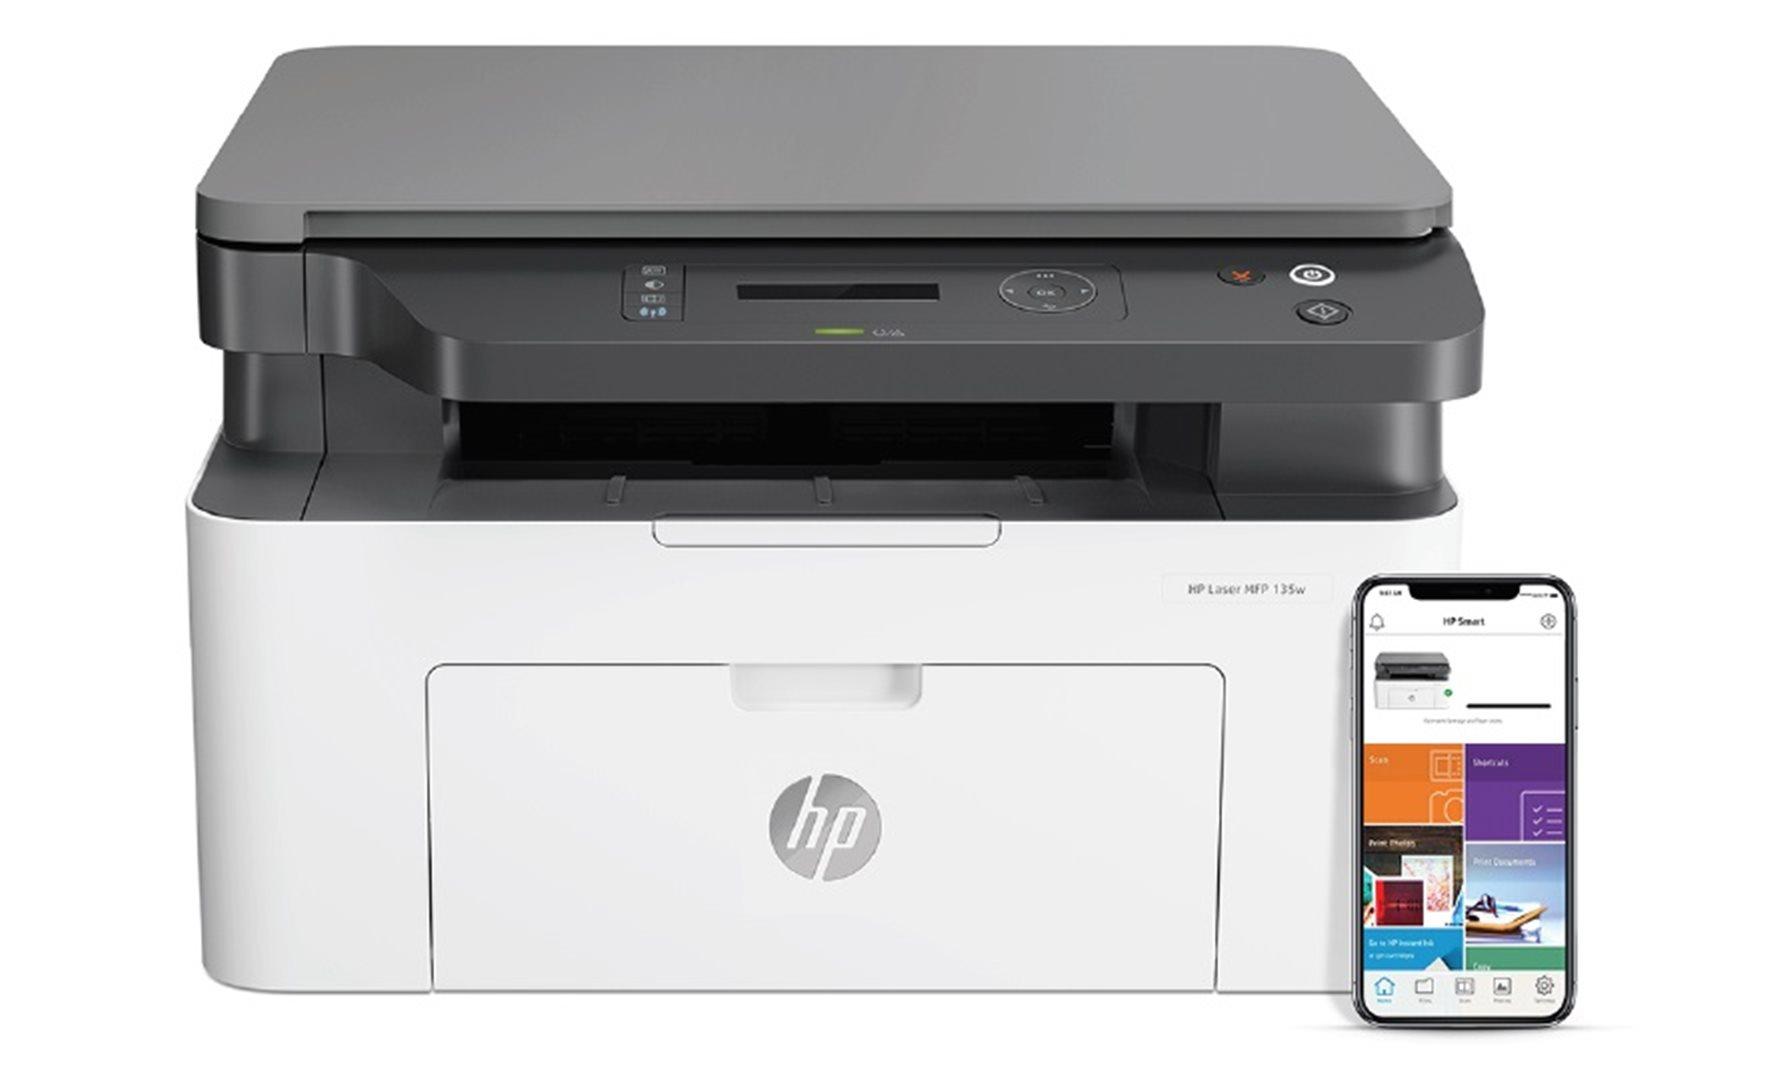 HP Laser MFP 135w 4ZB83A